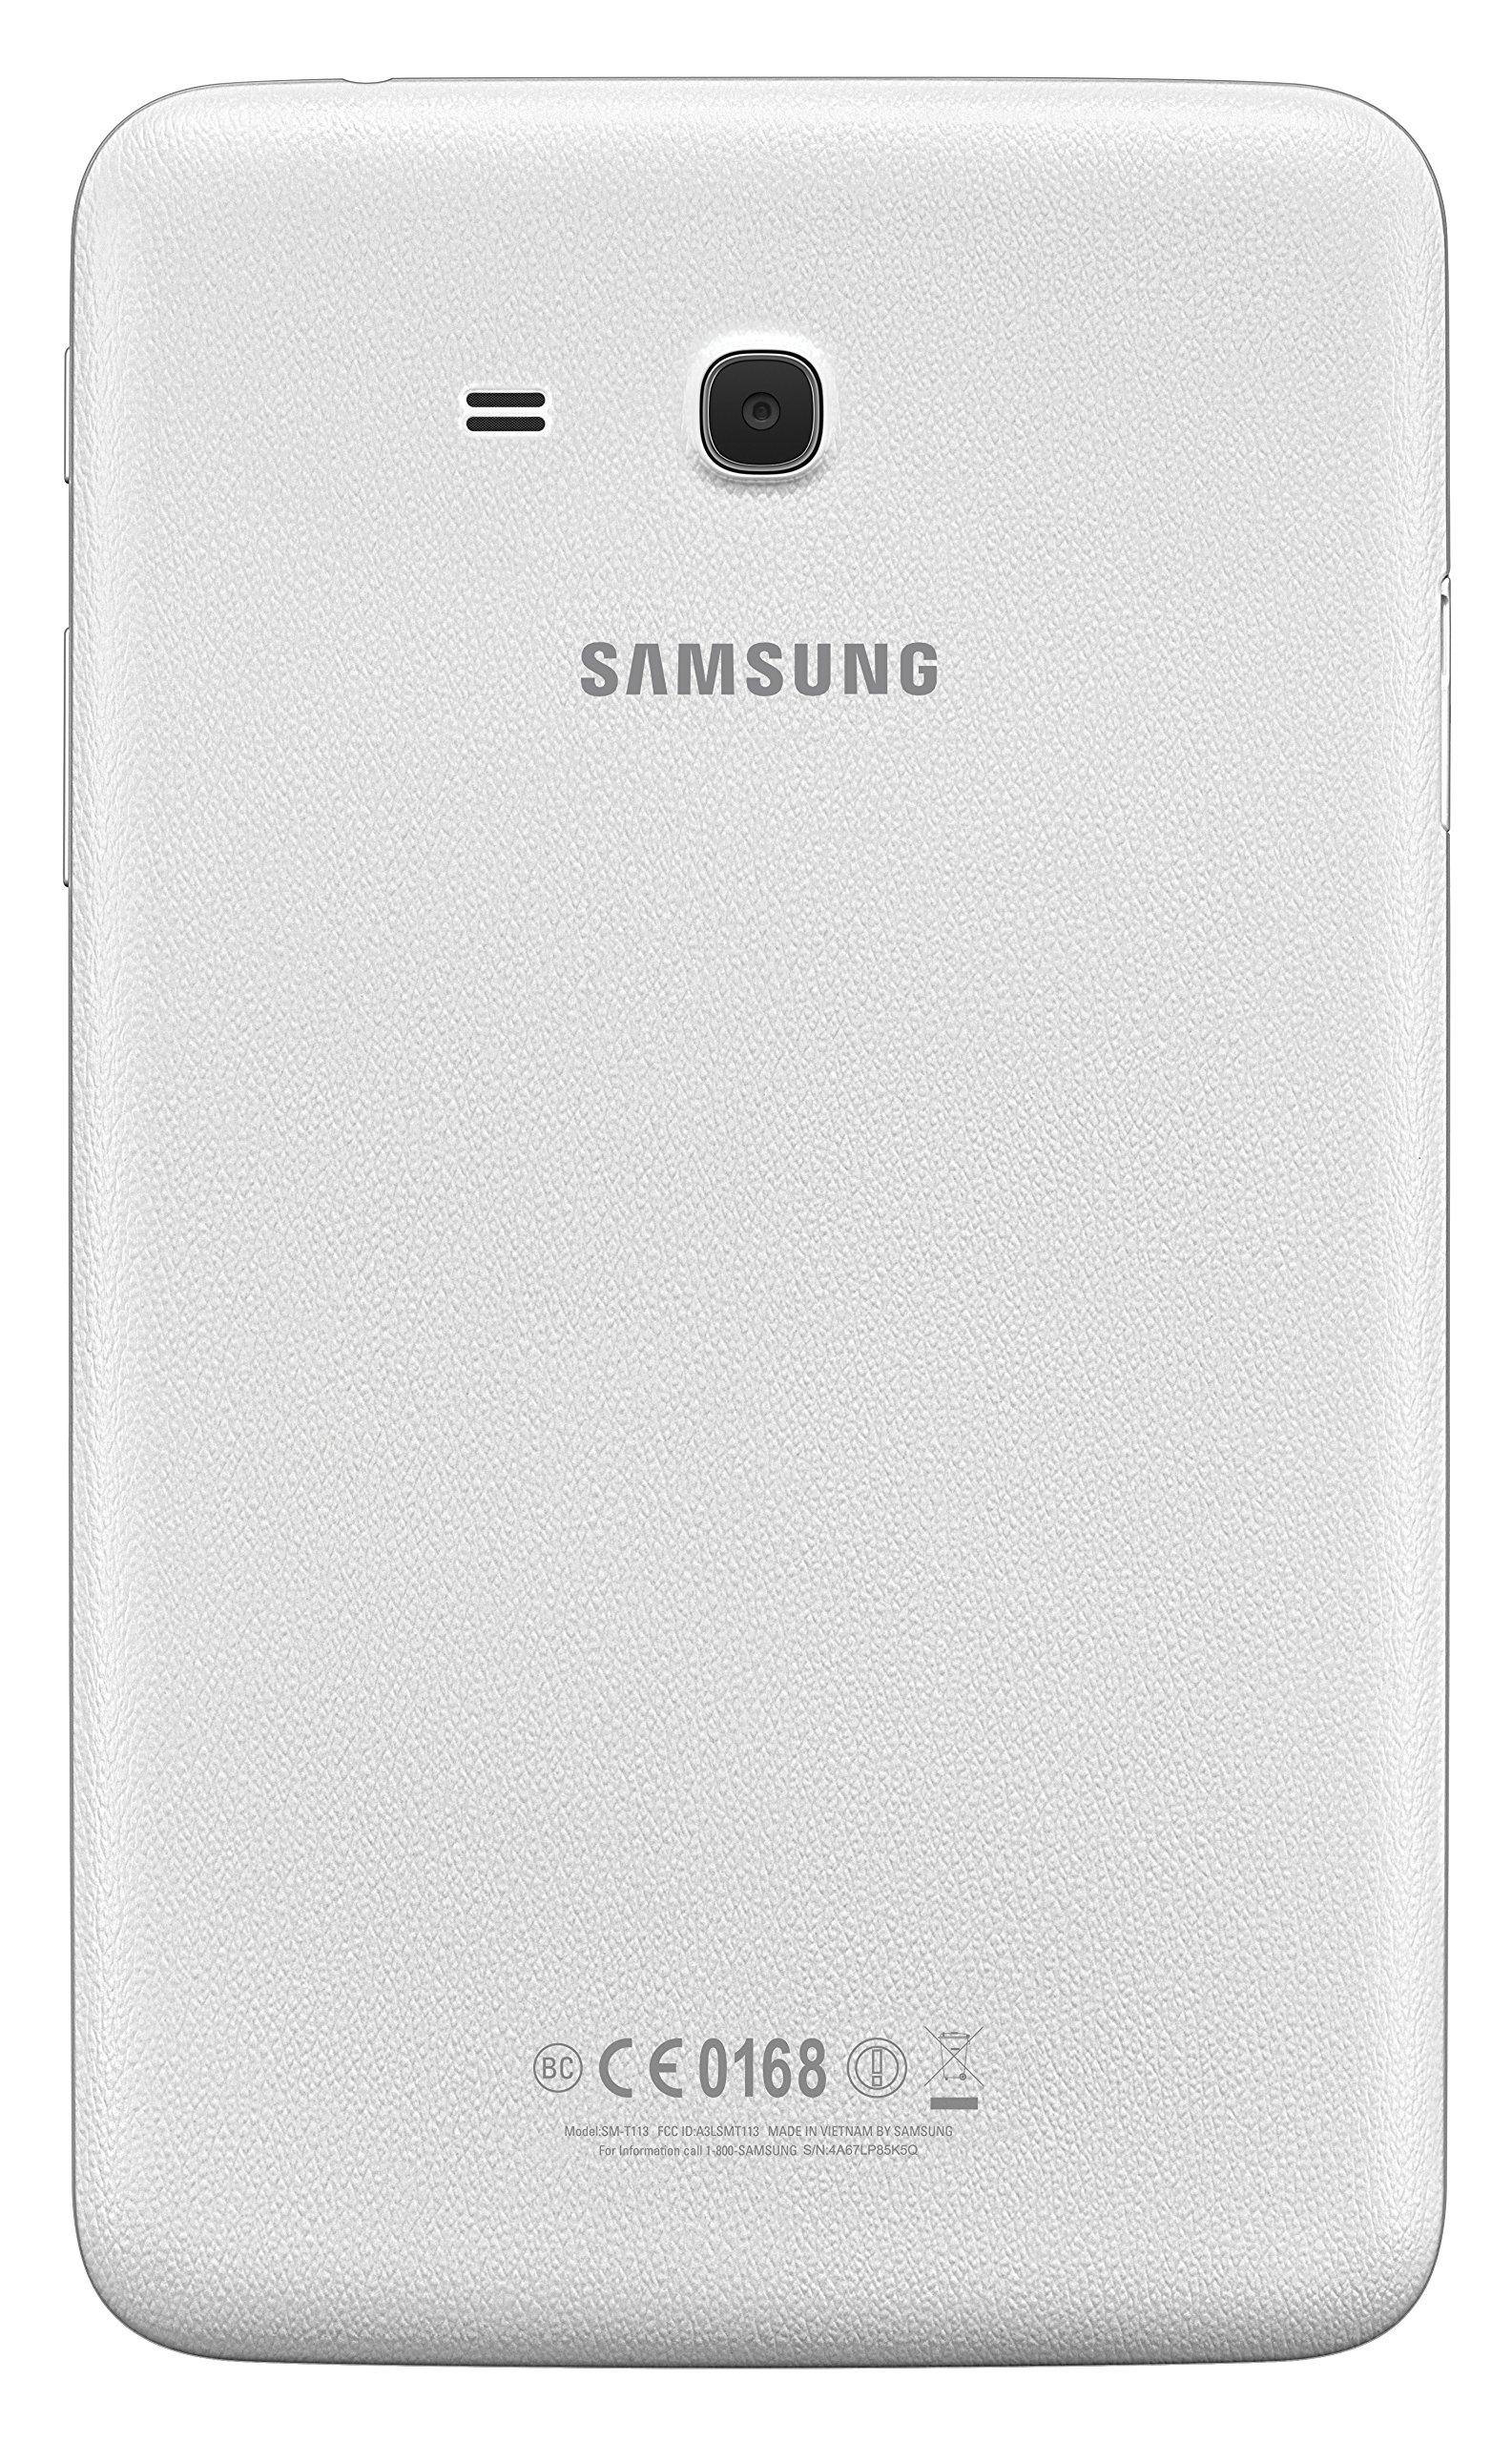 Samsung Galaxy Tab E Lite 7''; 8 GB Wifi Tablet (White) SM-T113NDWAXAR by Samsung (Image #6)